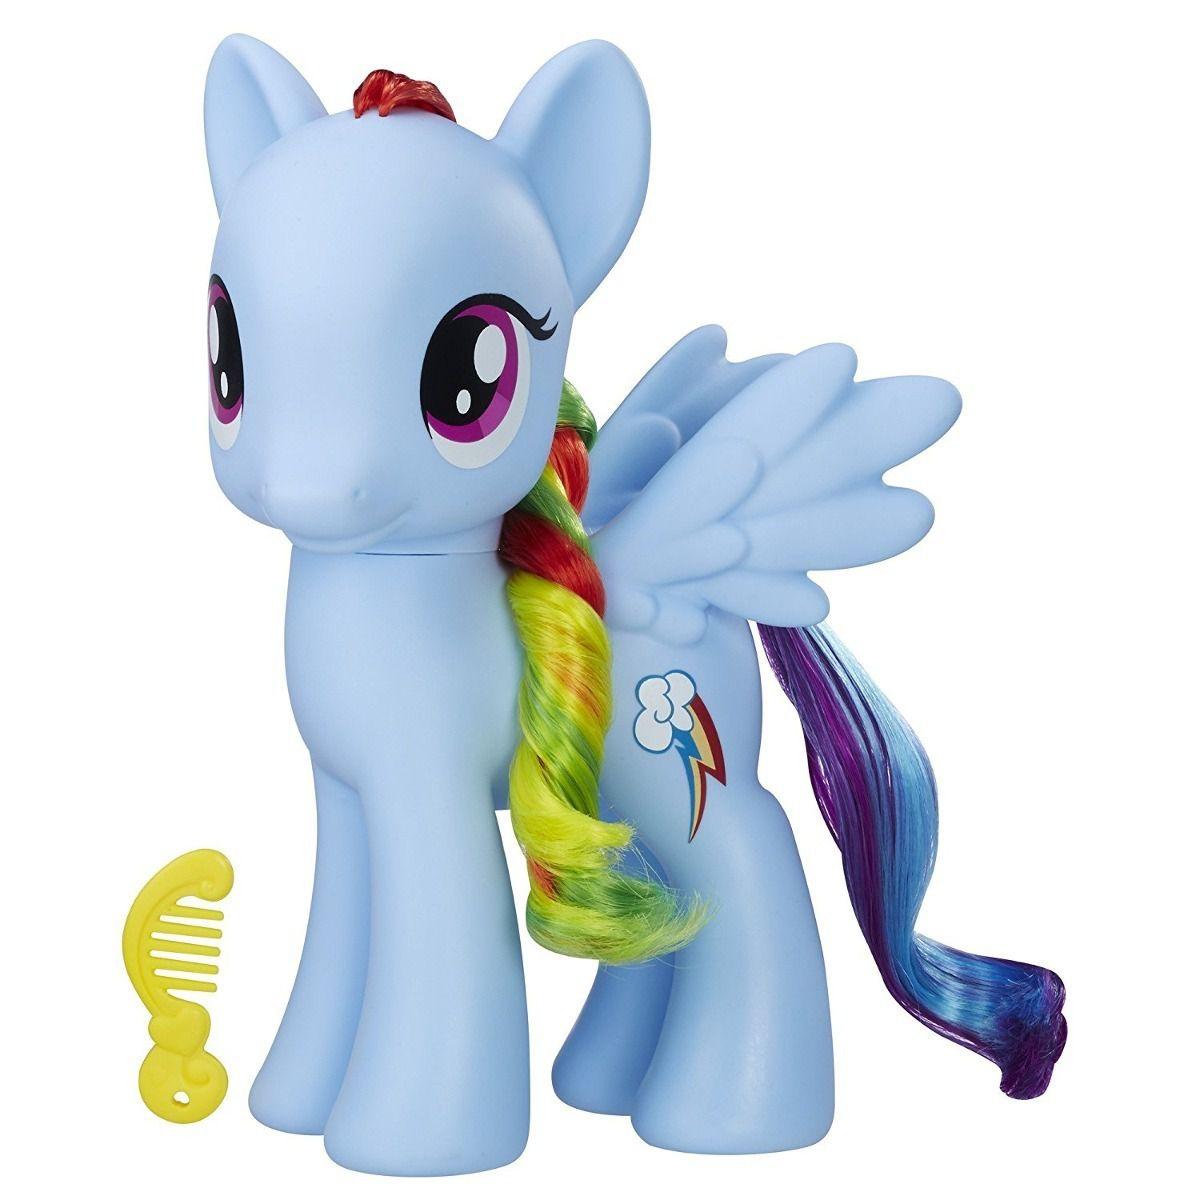 My Little Pony Rainbow Dash 20 cm C2167 / B0368 - Hasbro